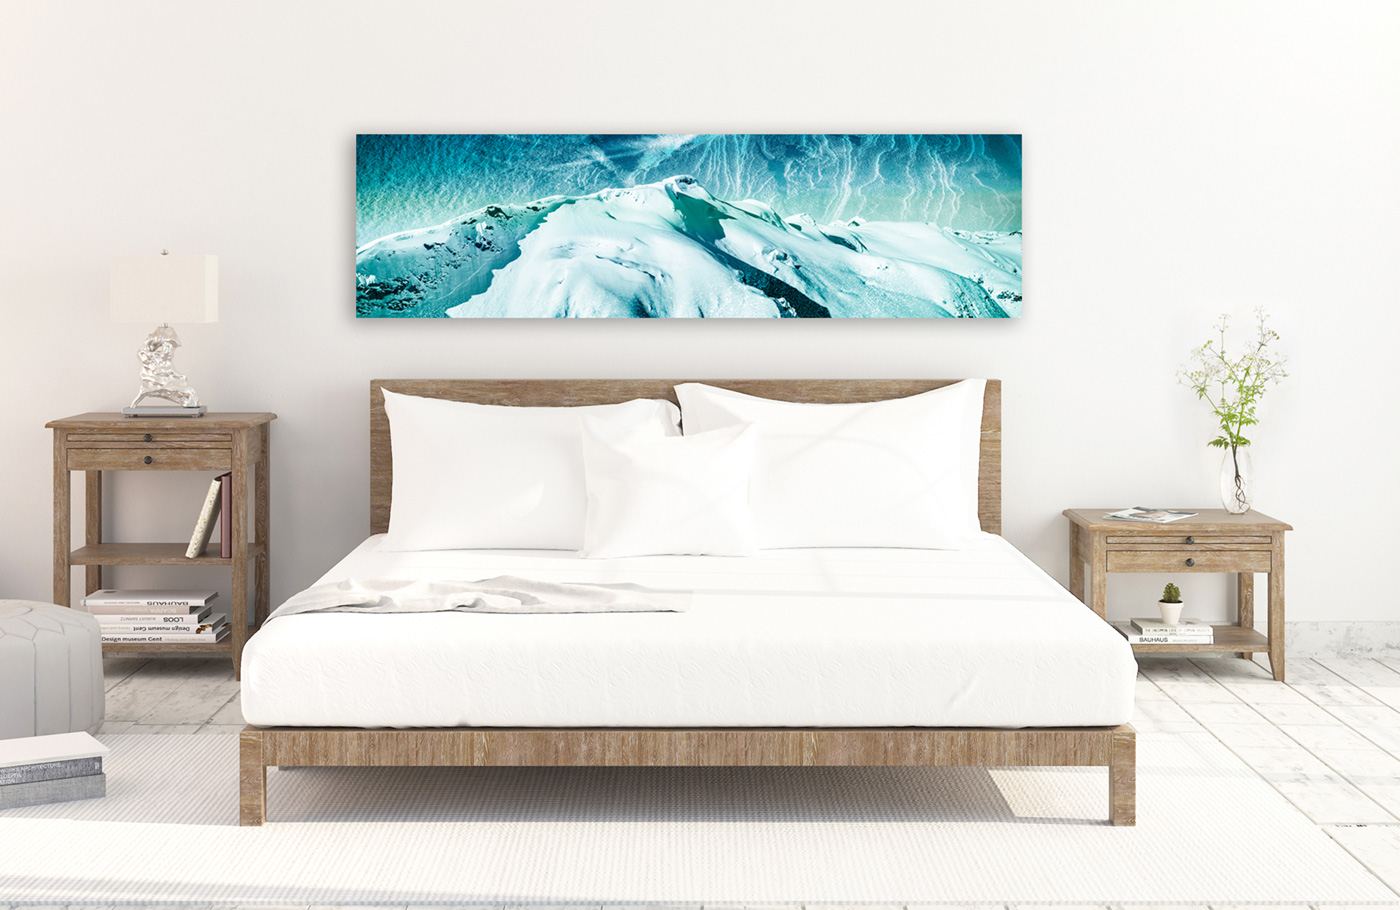 Discovery Ice Cap 3 - Panoramic